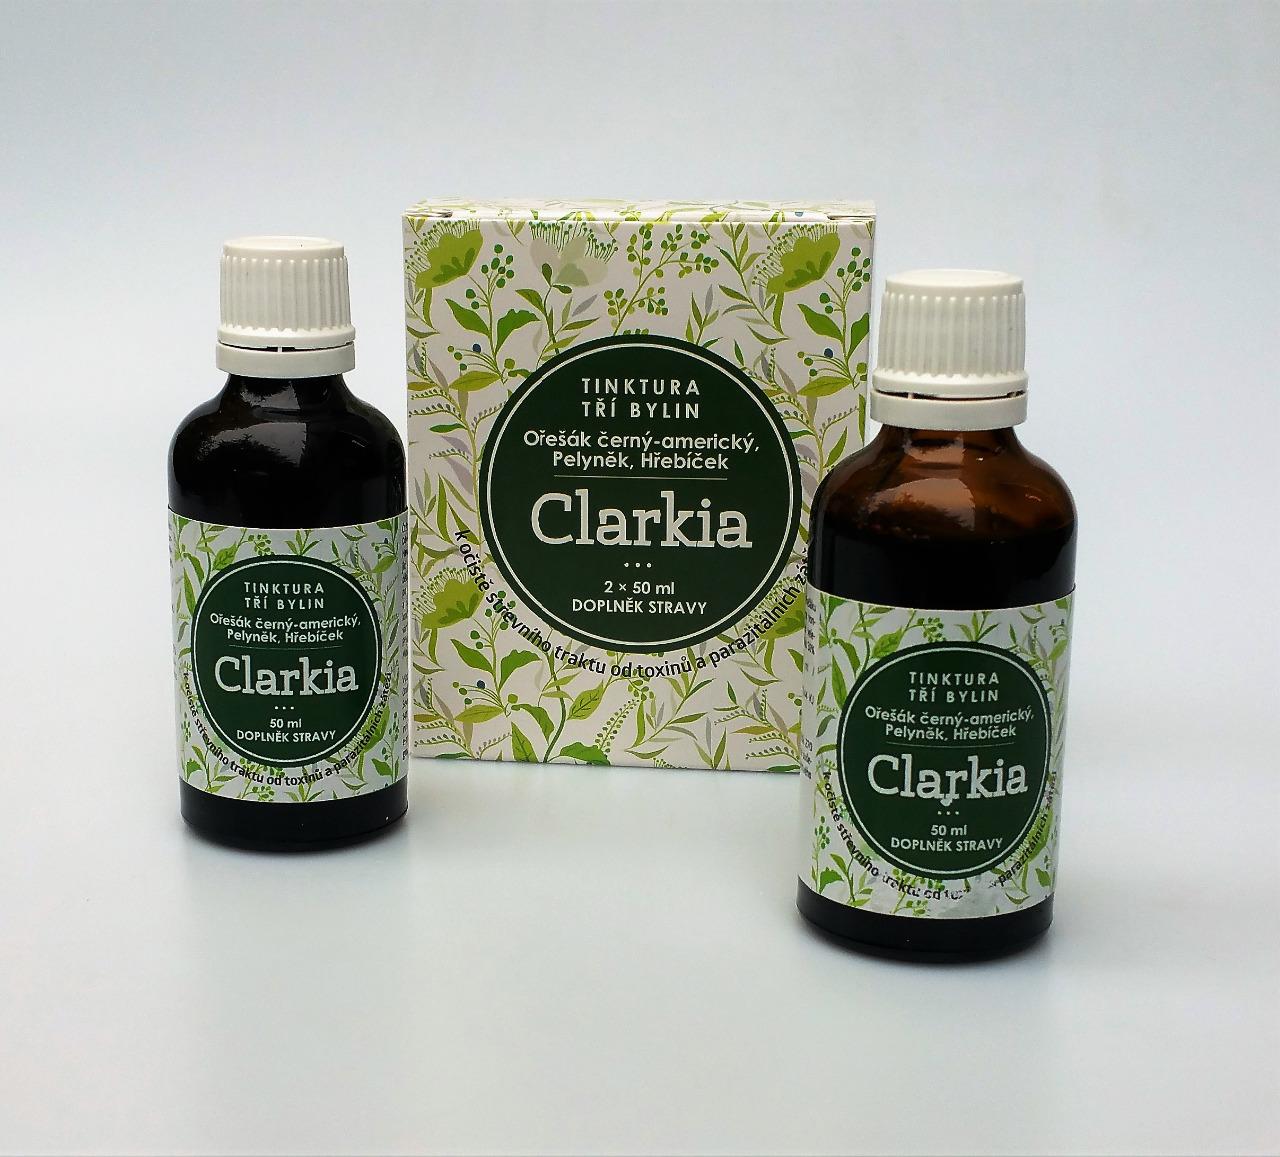 Clarkia